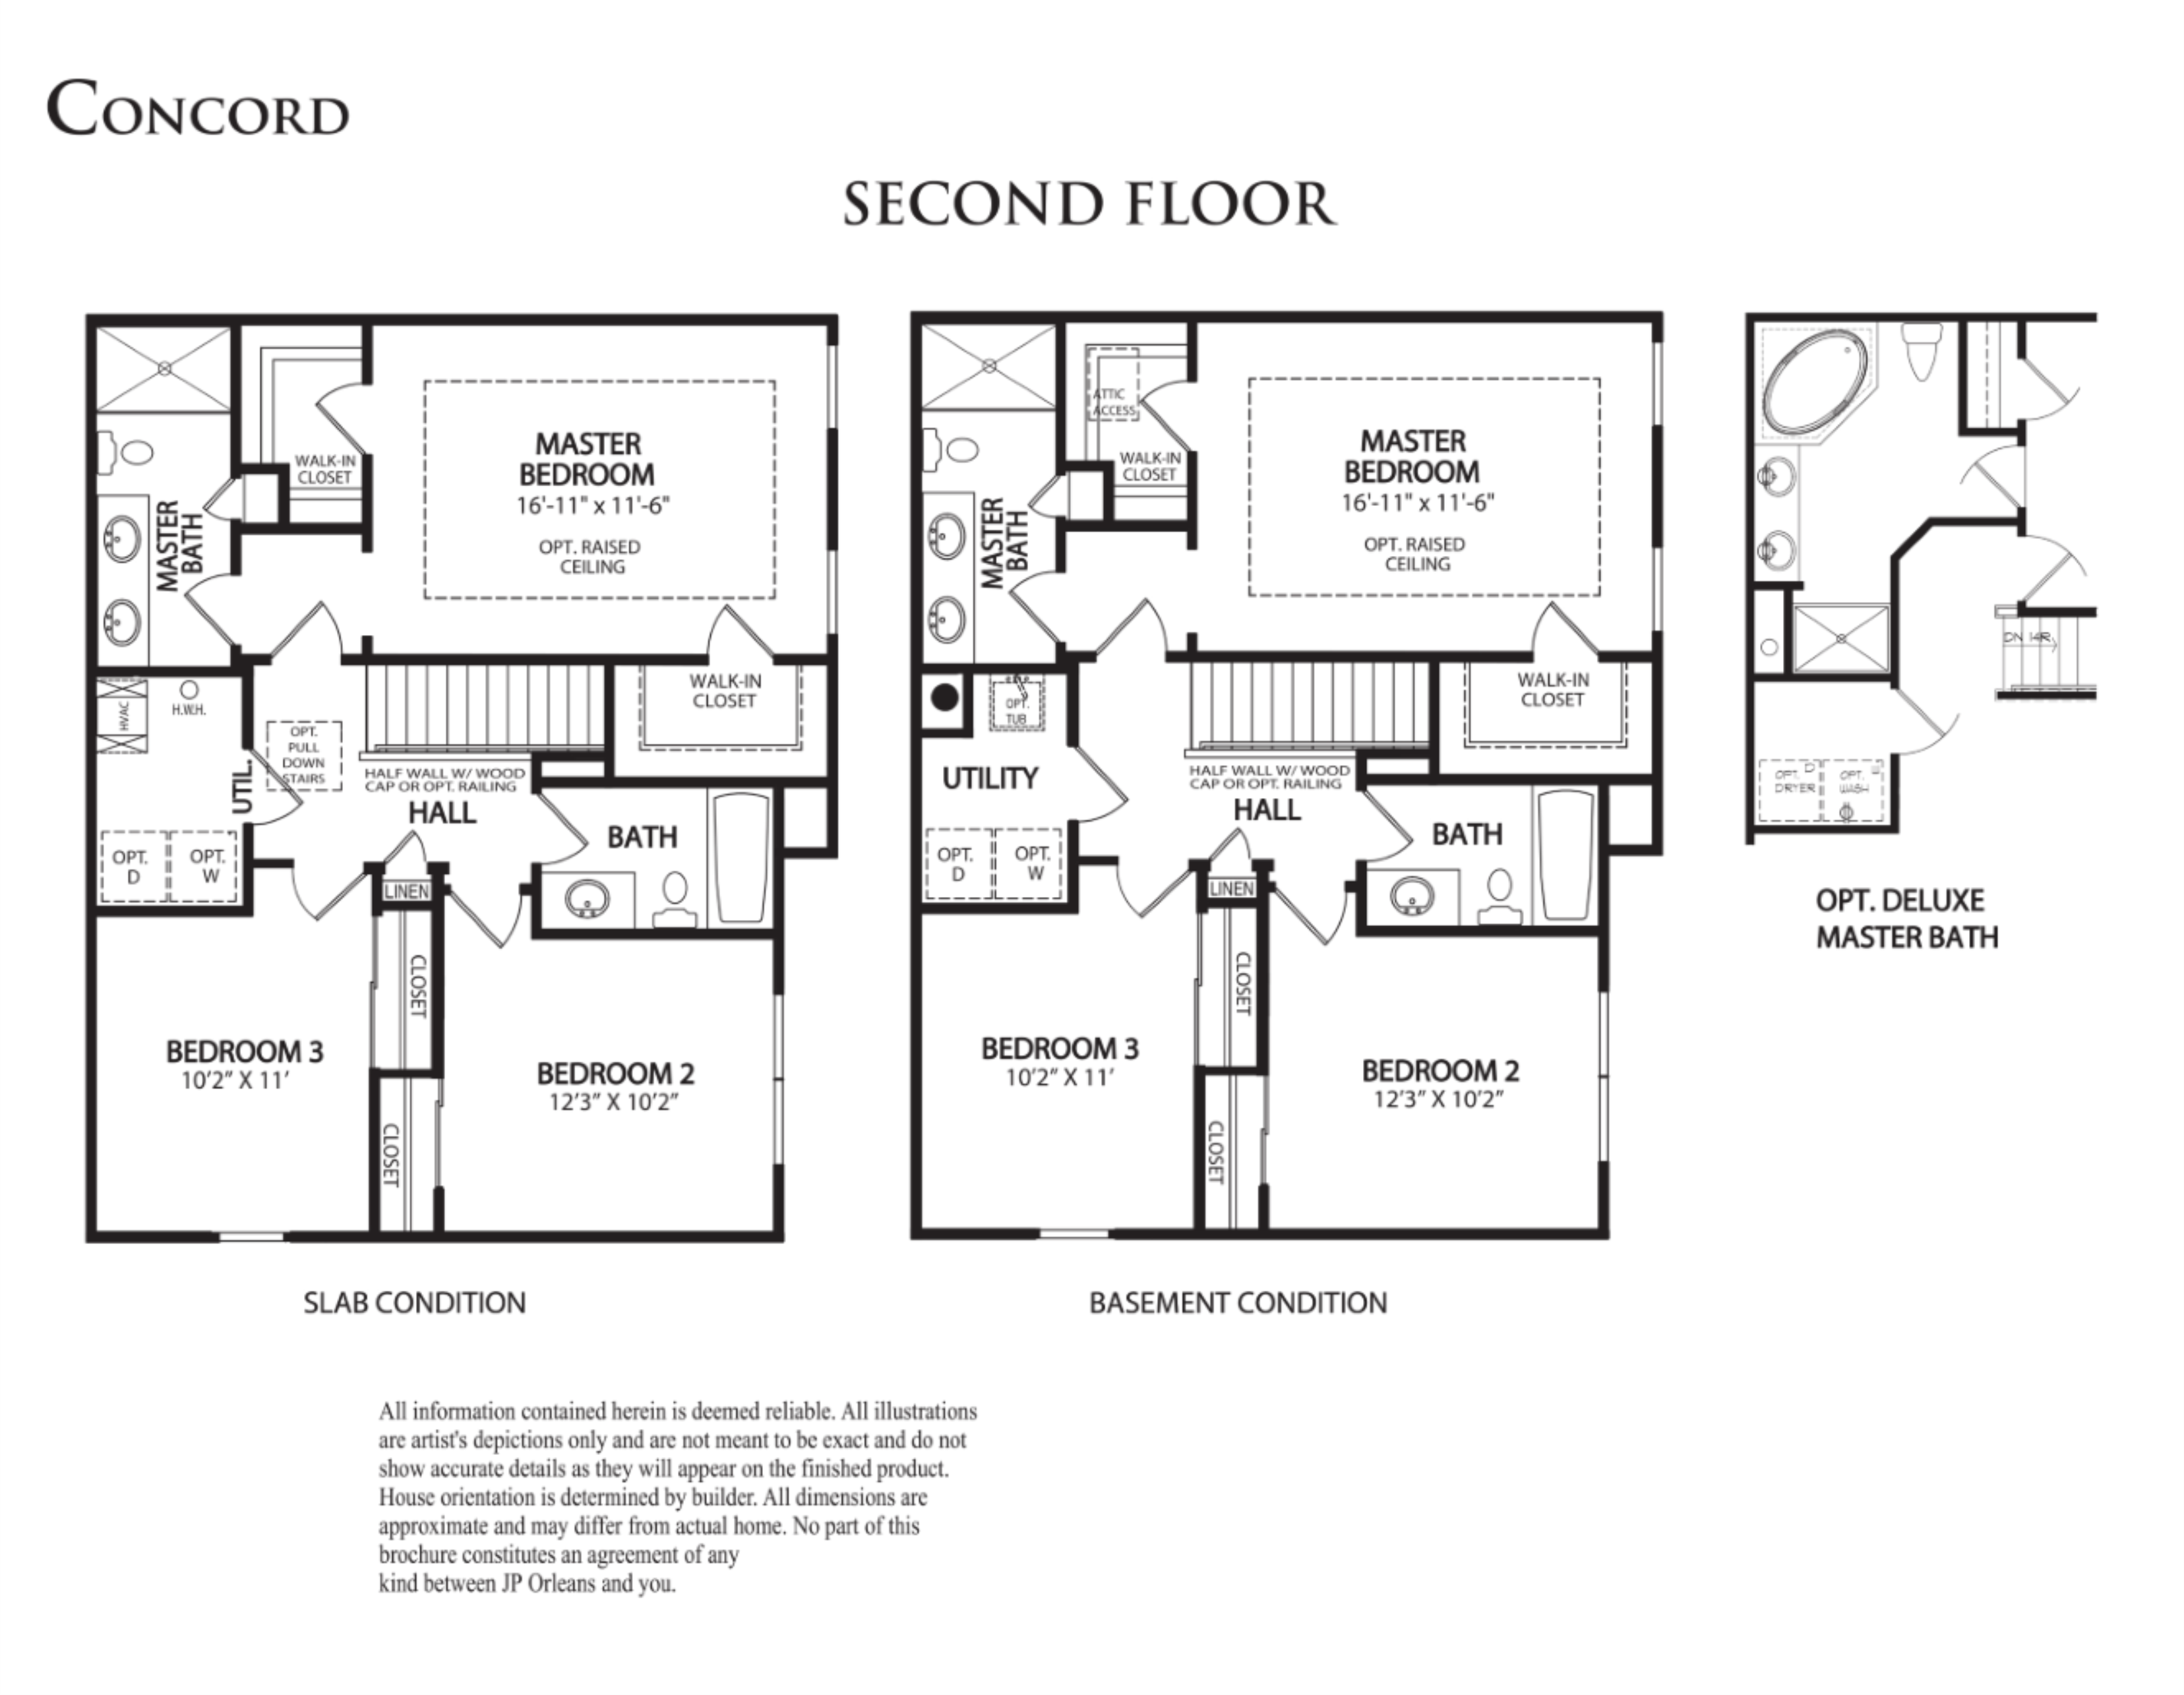 Lexington-Concord-2nd-Floor-1.png